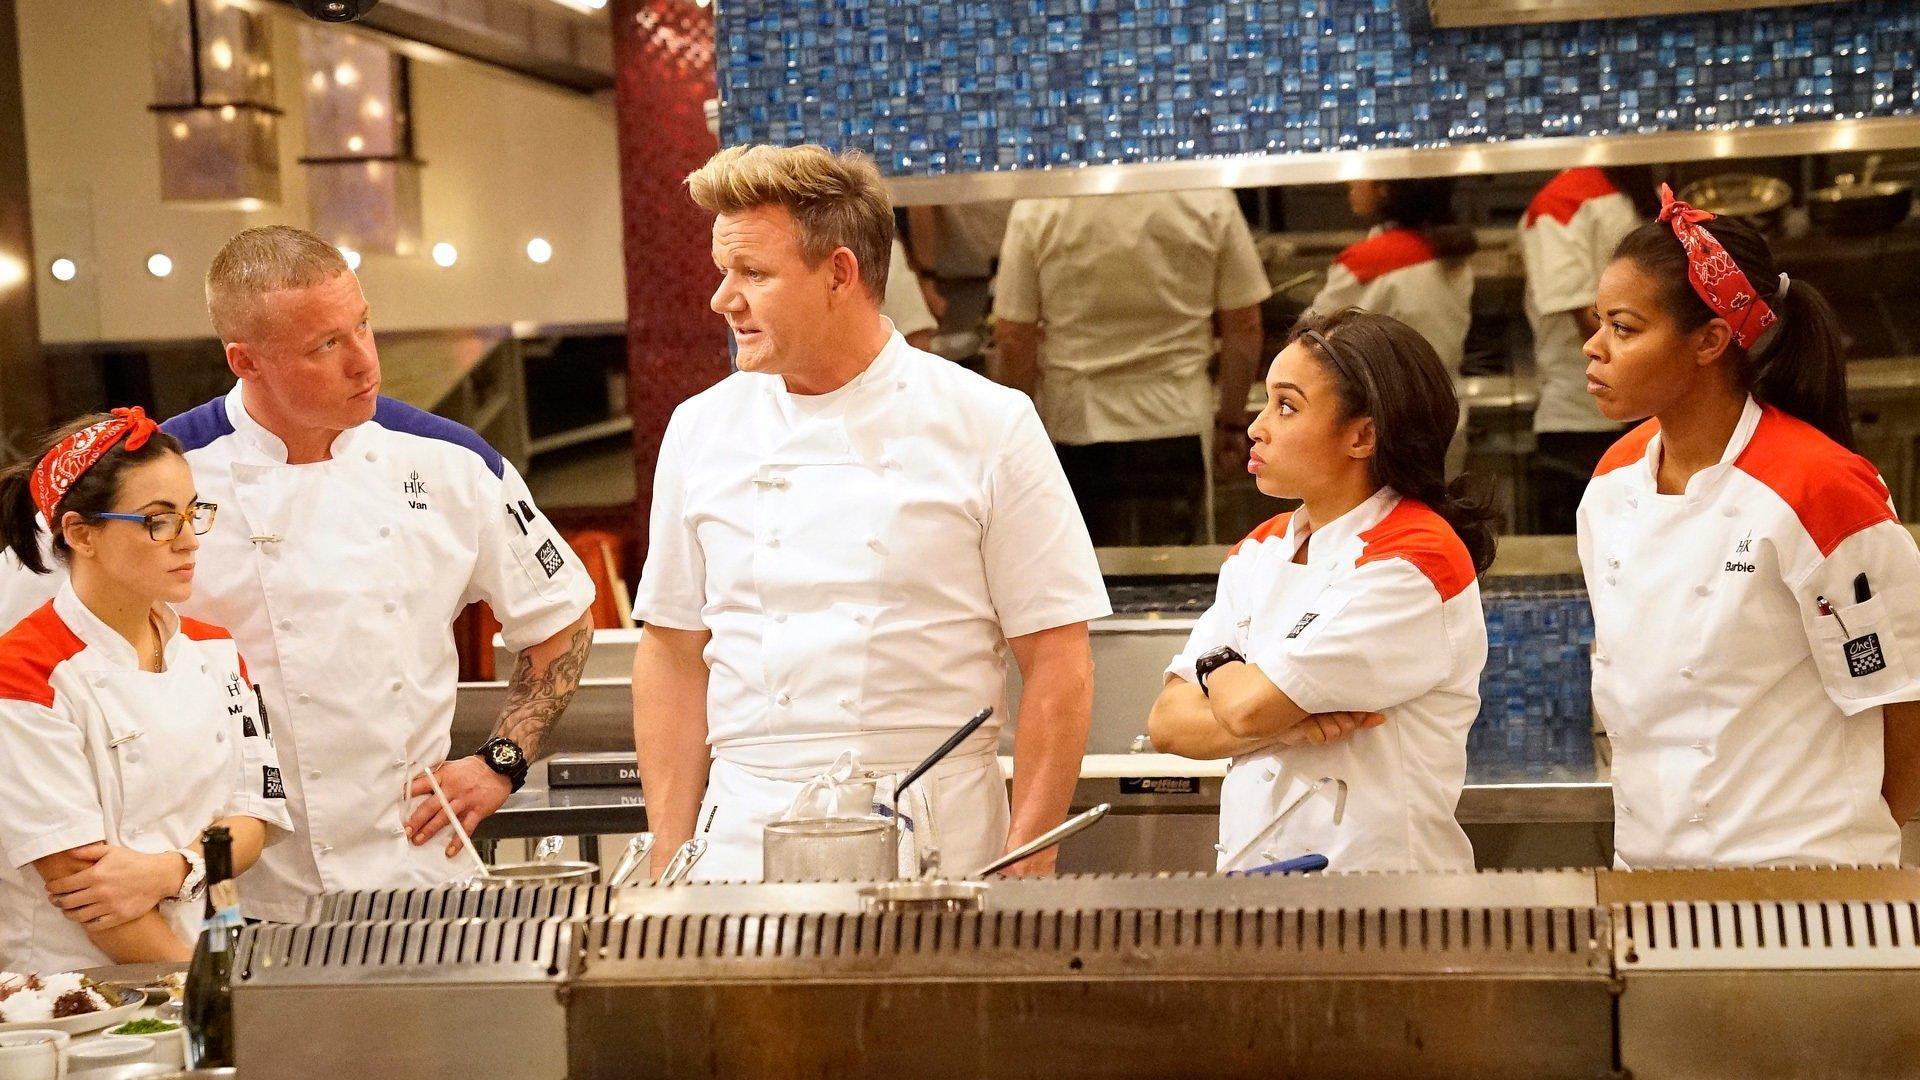 Hell S Kitchen Us S17e07 Trimming Fat Summary Season